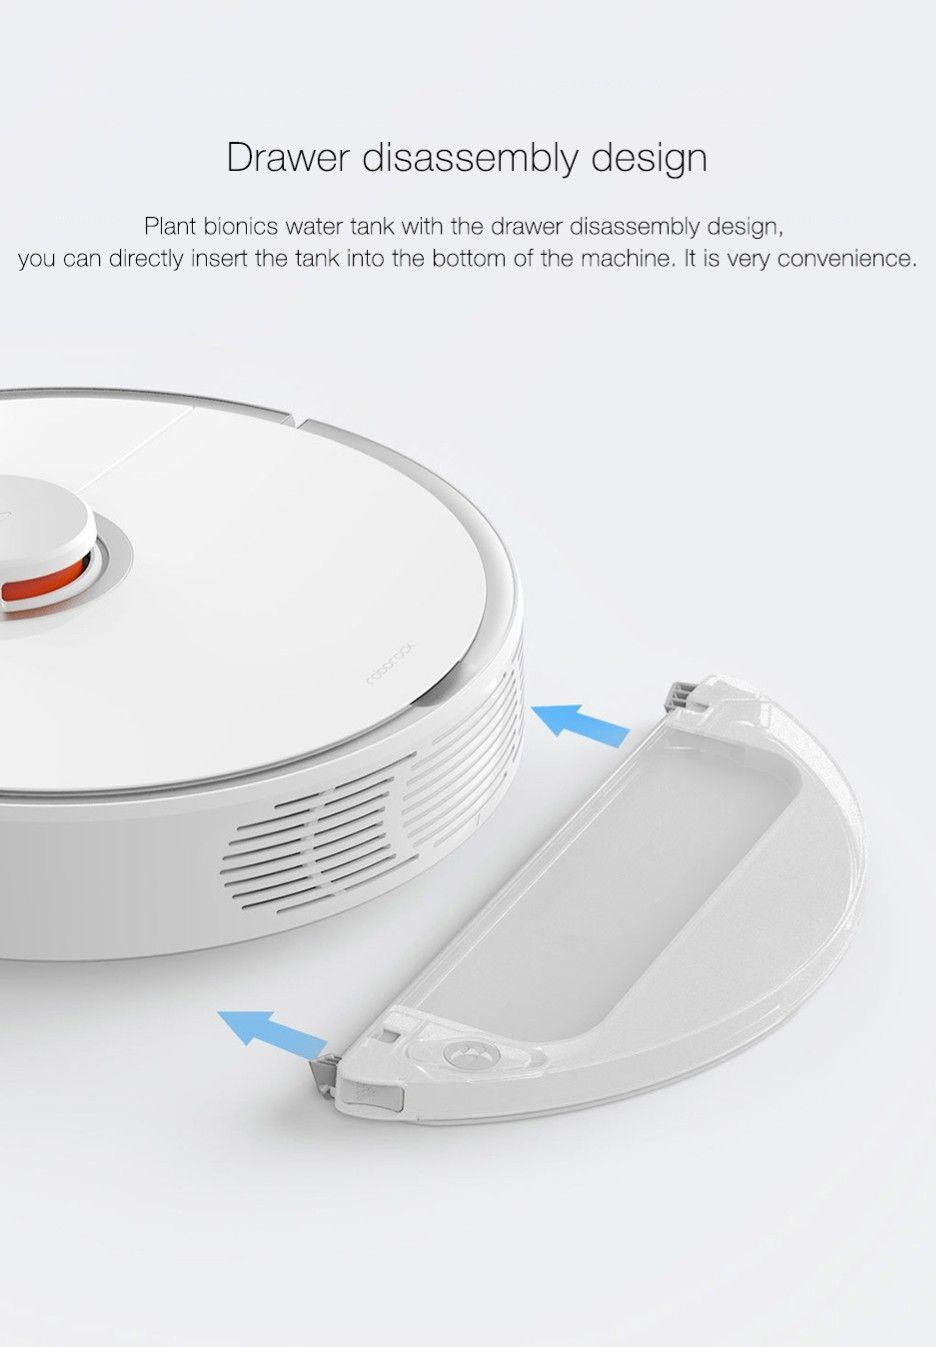 Roomba 2020 comparison s9 vs i7 vs e5 vs 980 vs 960